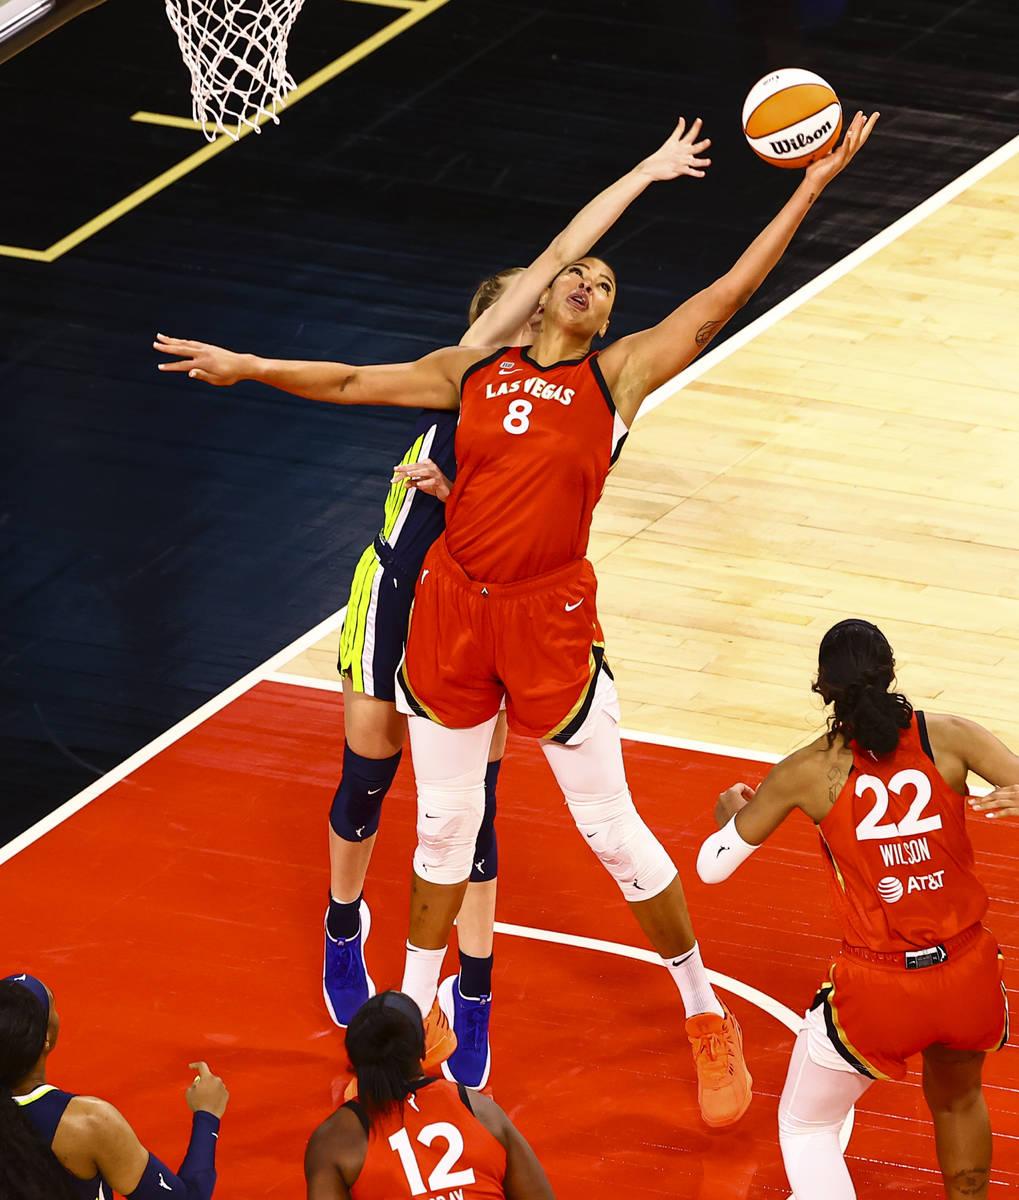 Las Vegas Aces' Liz Cambage (8) grabs a rebound against Dallas Wings' Bella Alarie (32) during ...